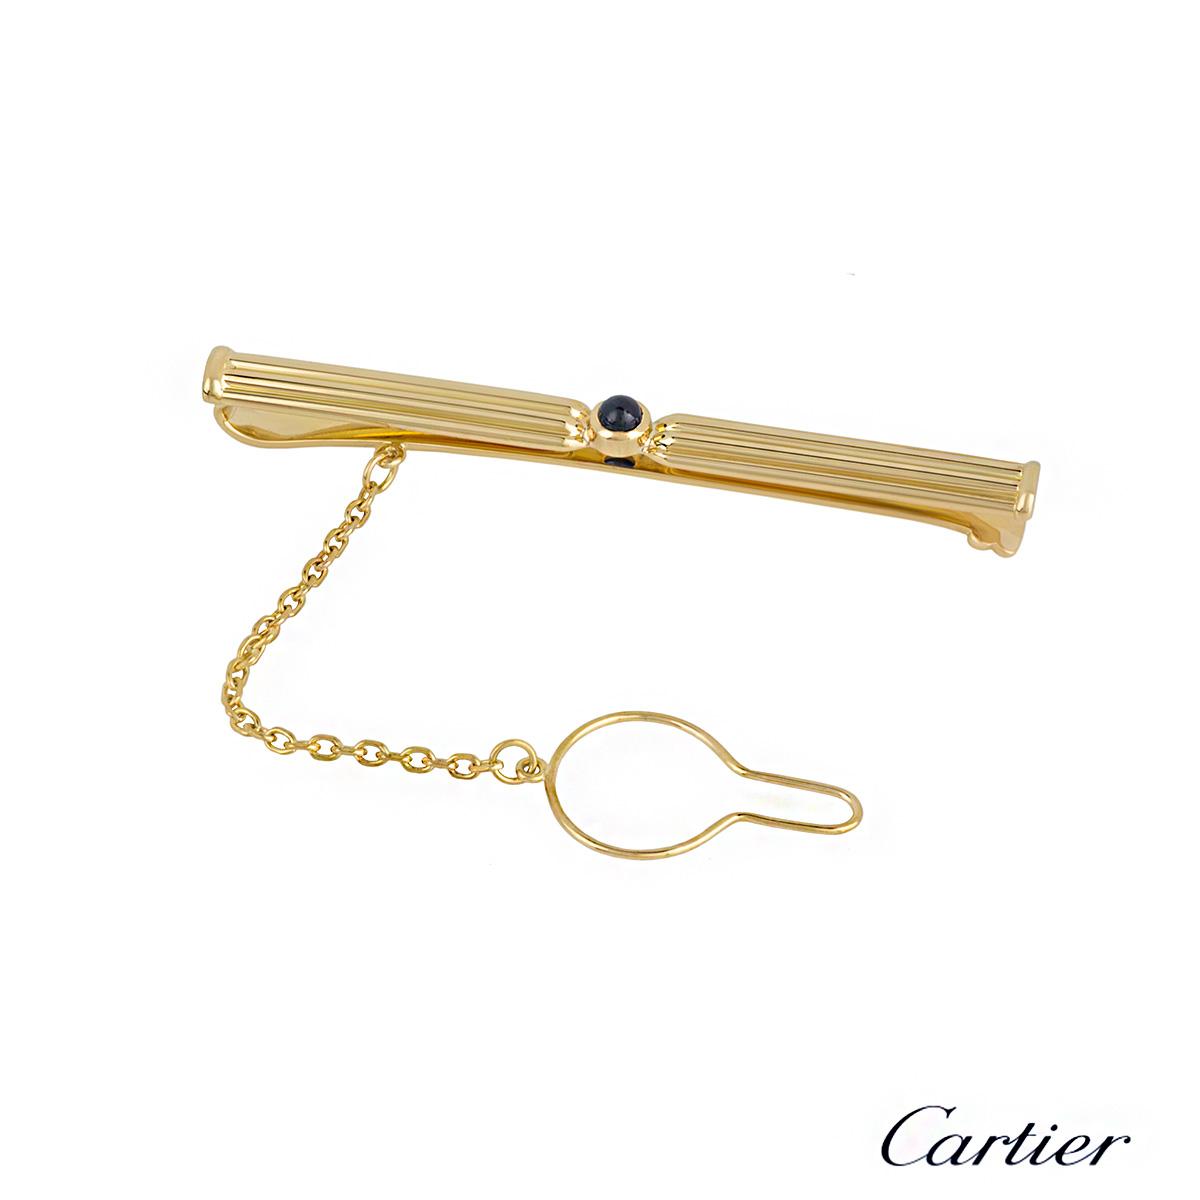 Cartier 18k Yellow Gold Sapphire Tie Clip